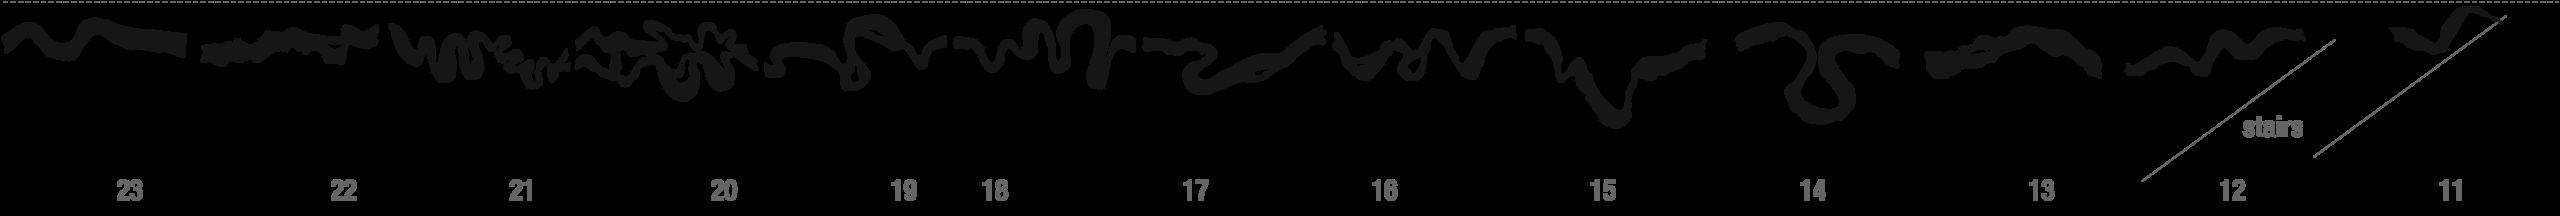 ATR-panel-layouts-3